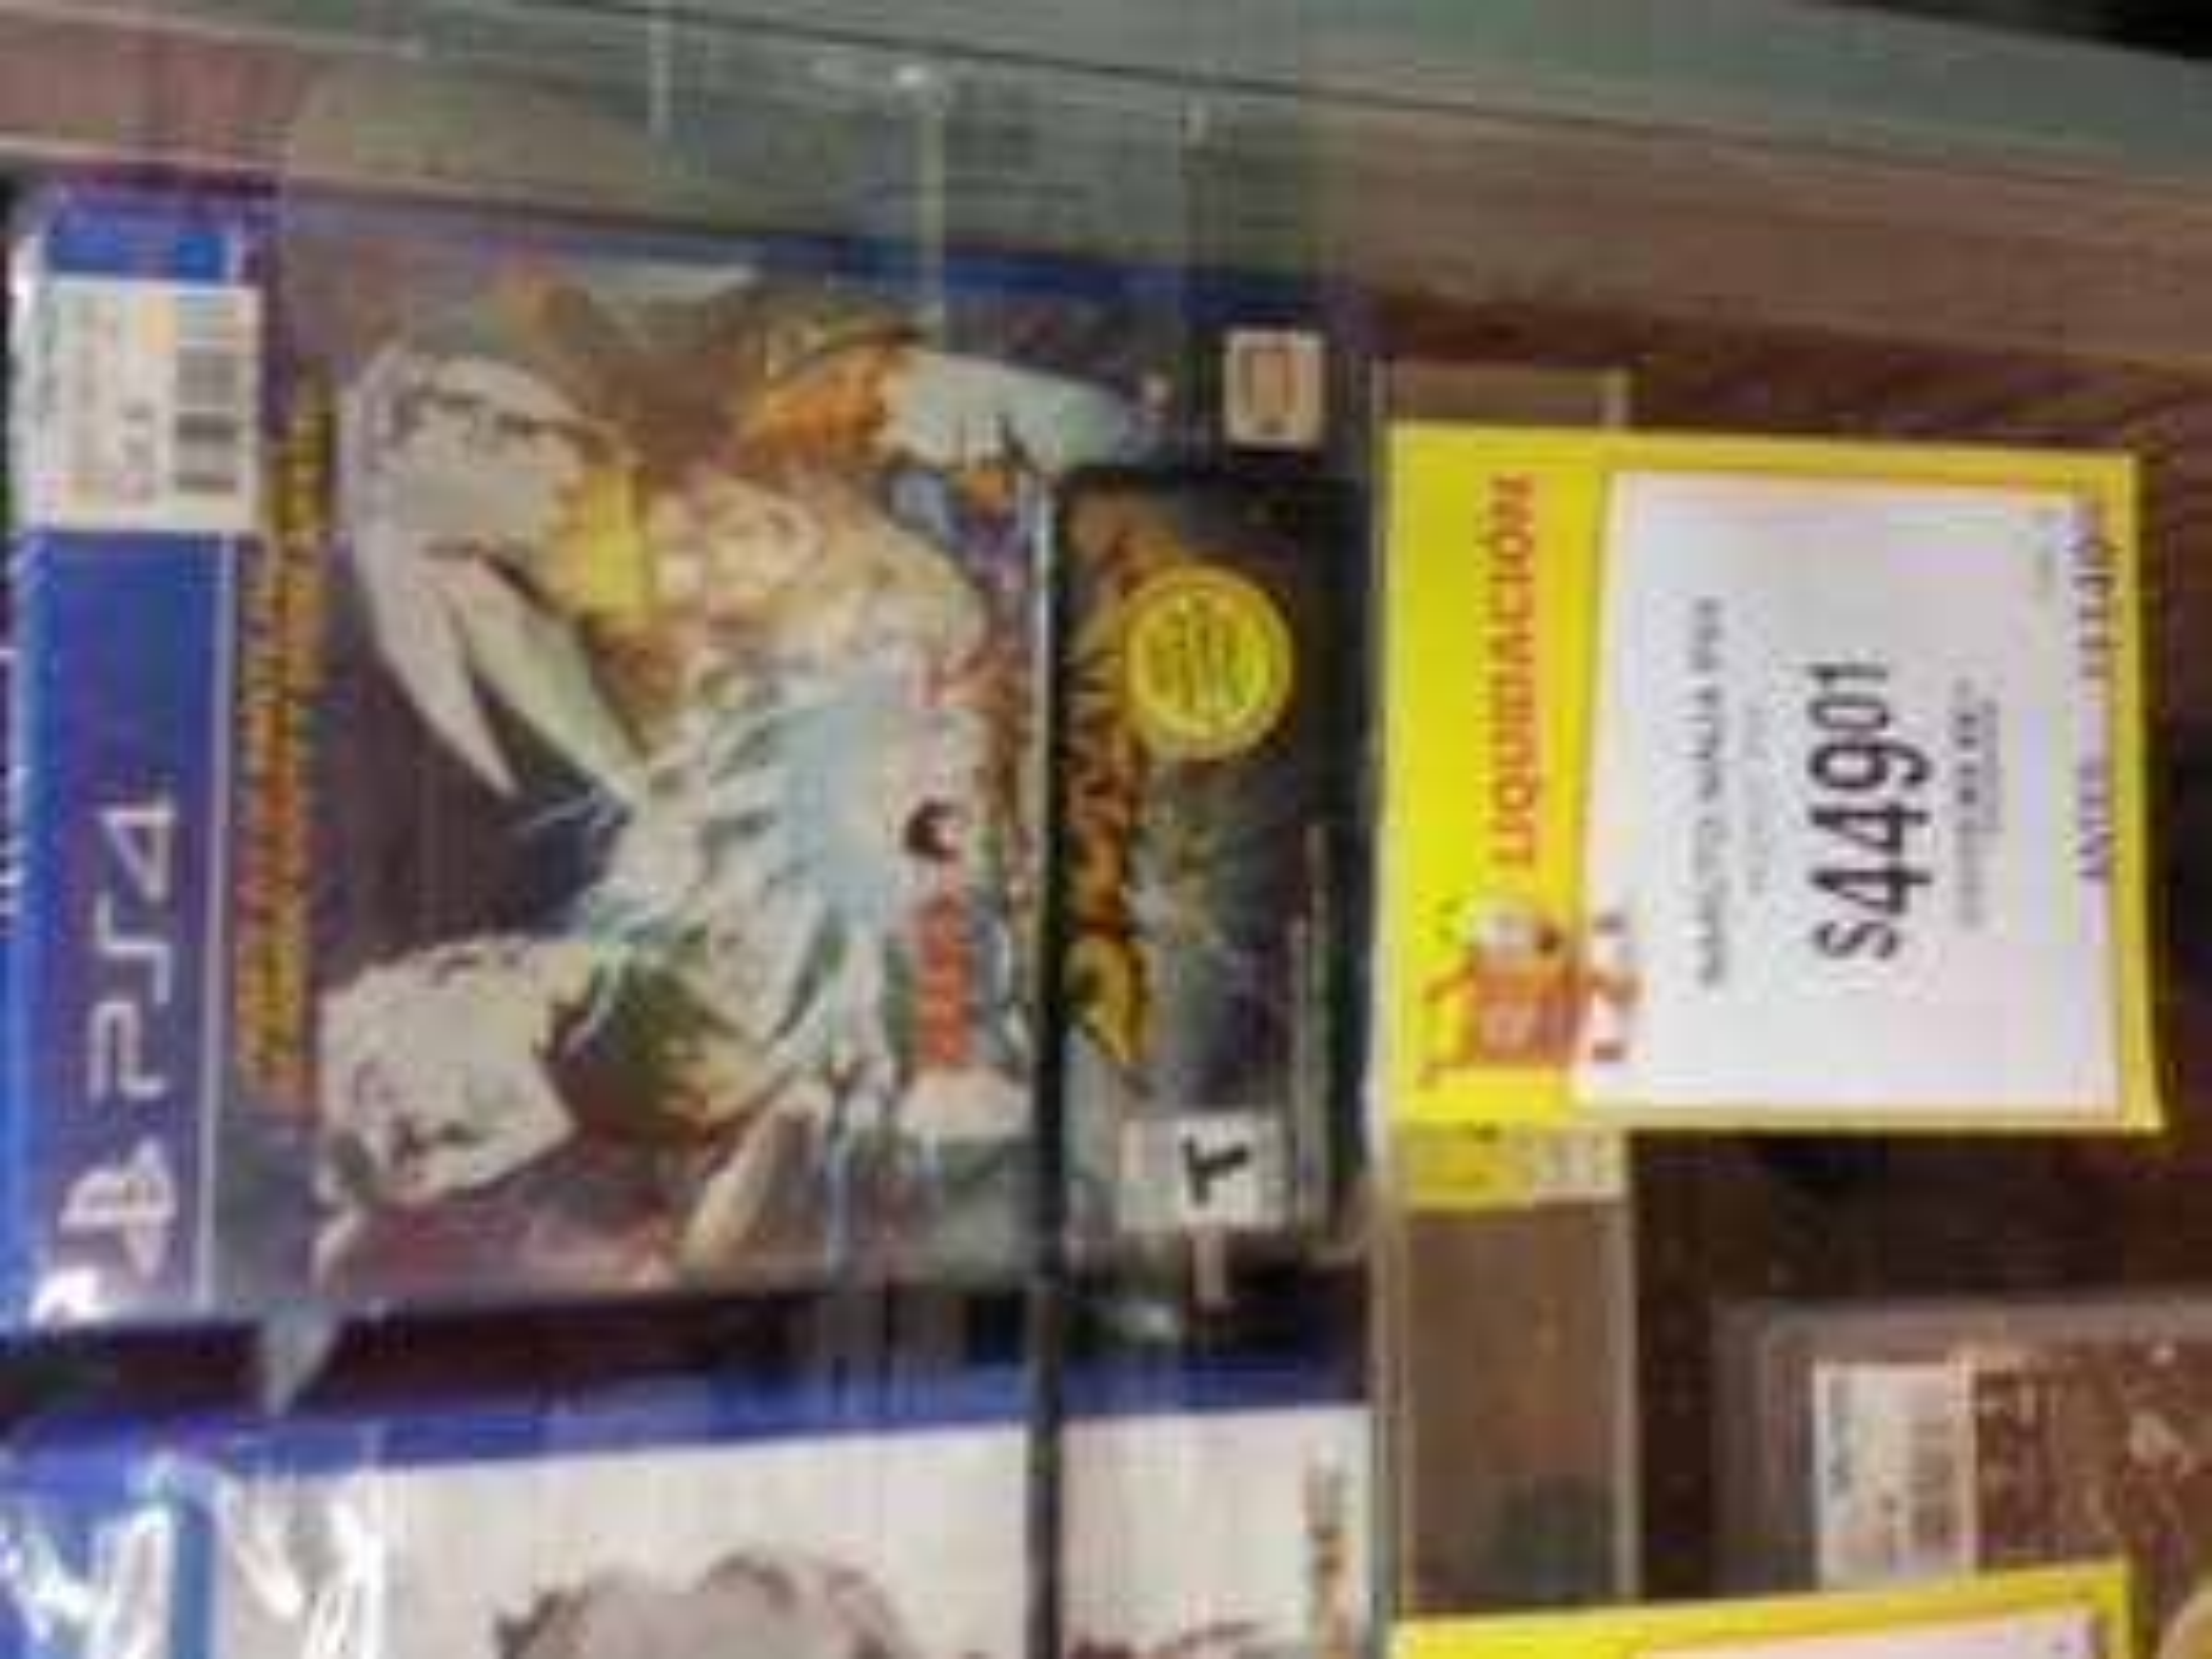 Walmart 68 Culiacán Sinaloa: Naruto ninja PS4 a $449.01